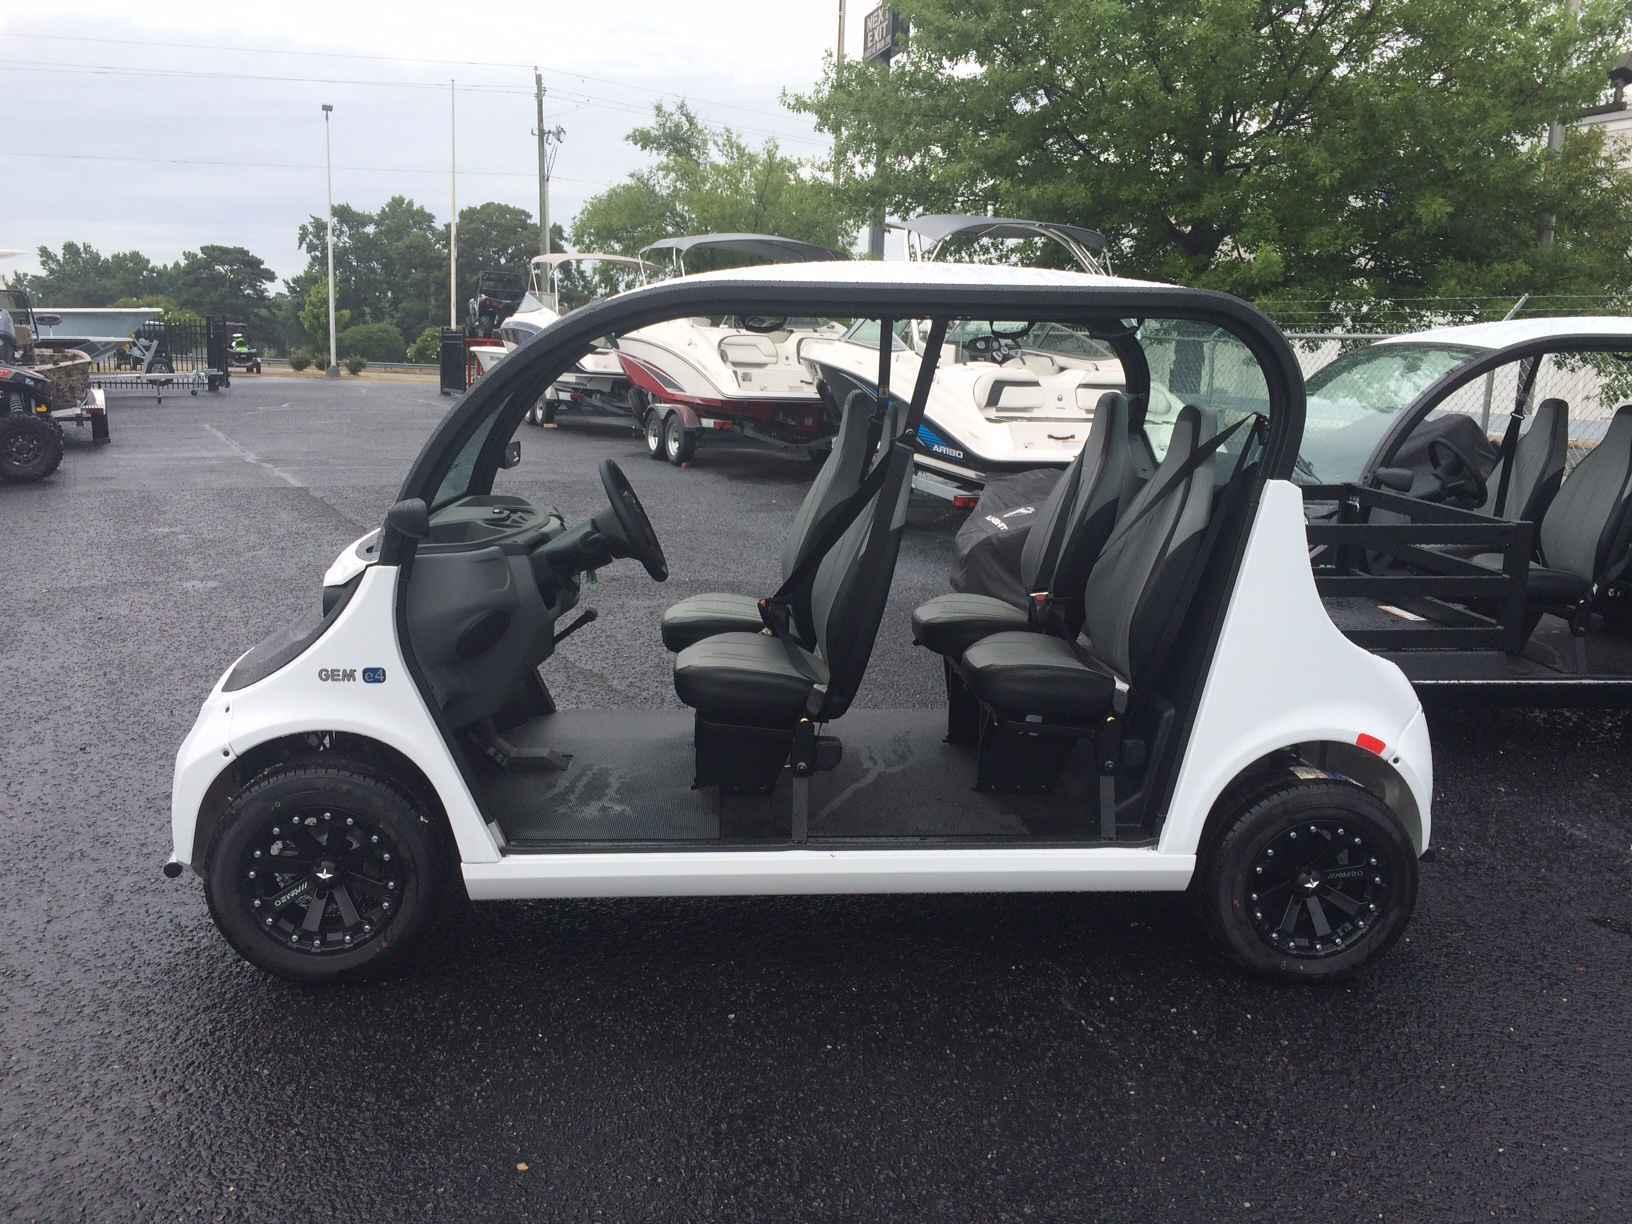 New 2016 Gem e4 ATVs For Sale in North Carolina on ATV Trades